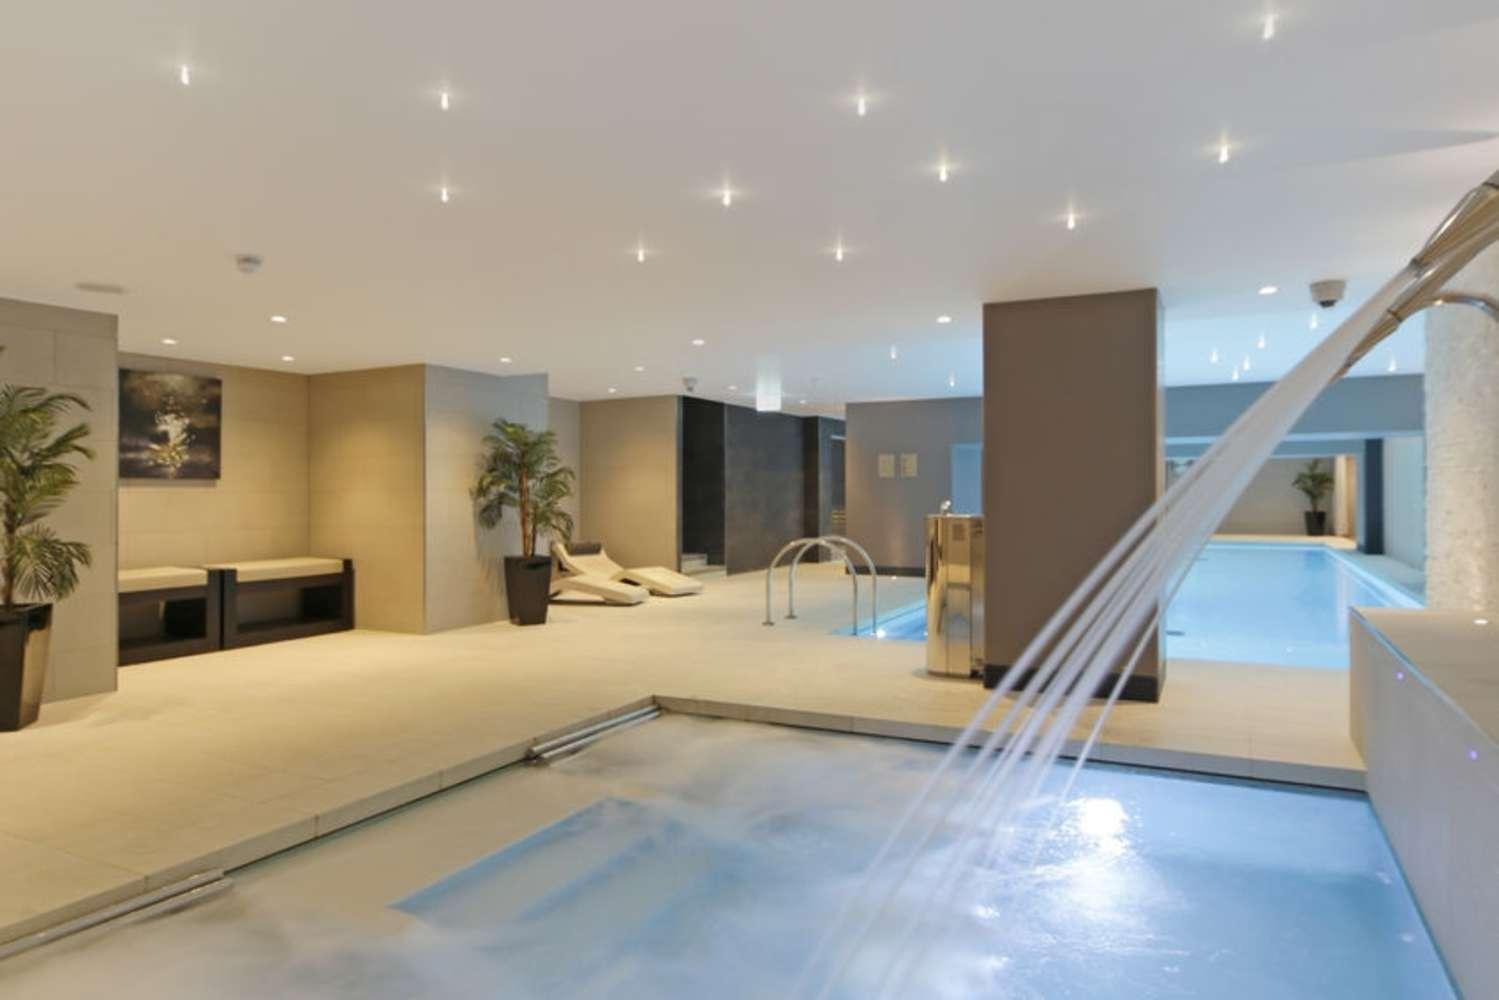 Apartment Warwick lane, W14 - Sherrin House, Royal Warwick Square, Warwick Lane, London - 00